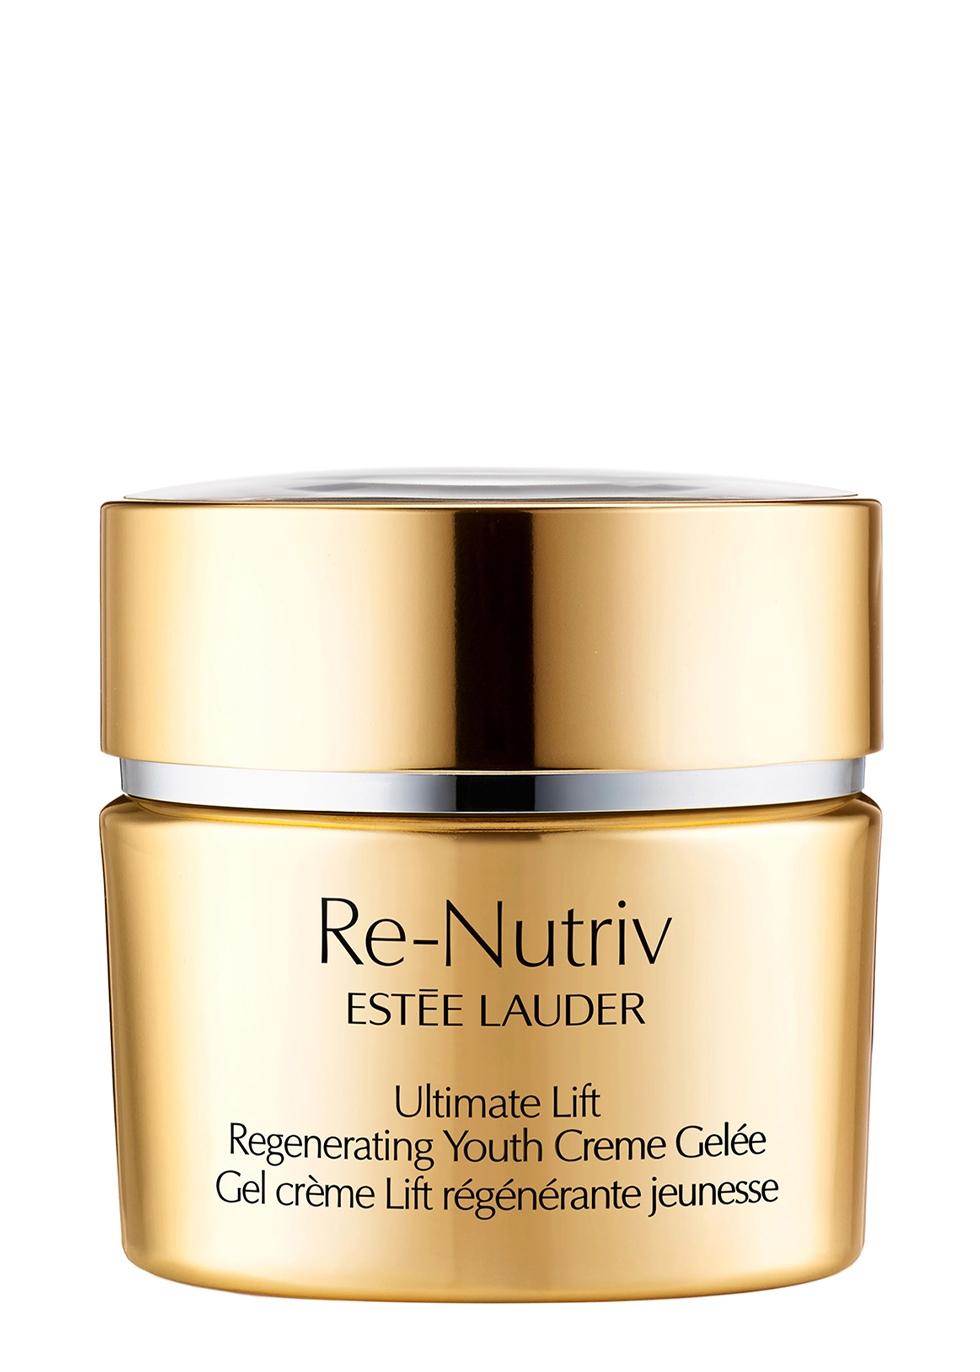 Re-Nutriv Ultimate Lift Regenerating Youth Creme Gelée 50ml